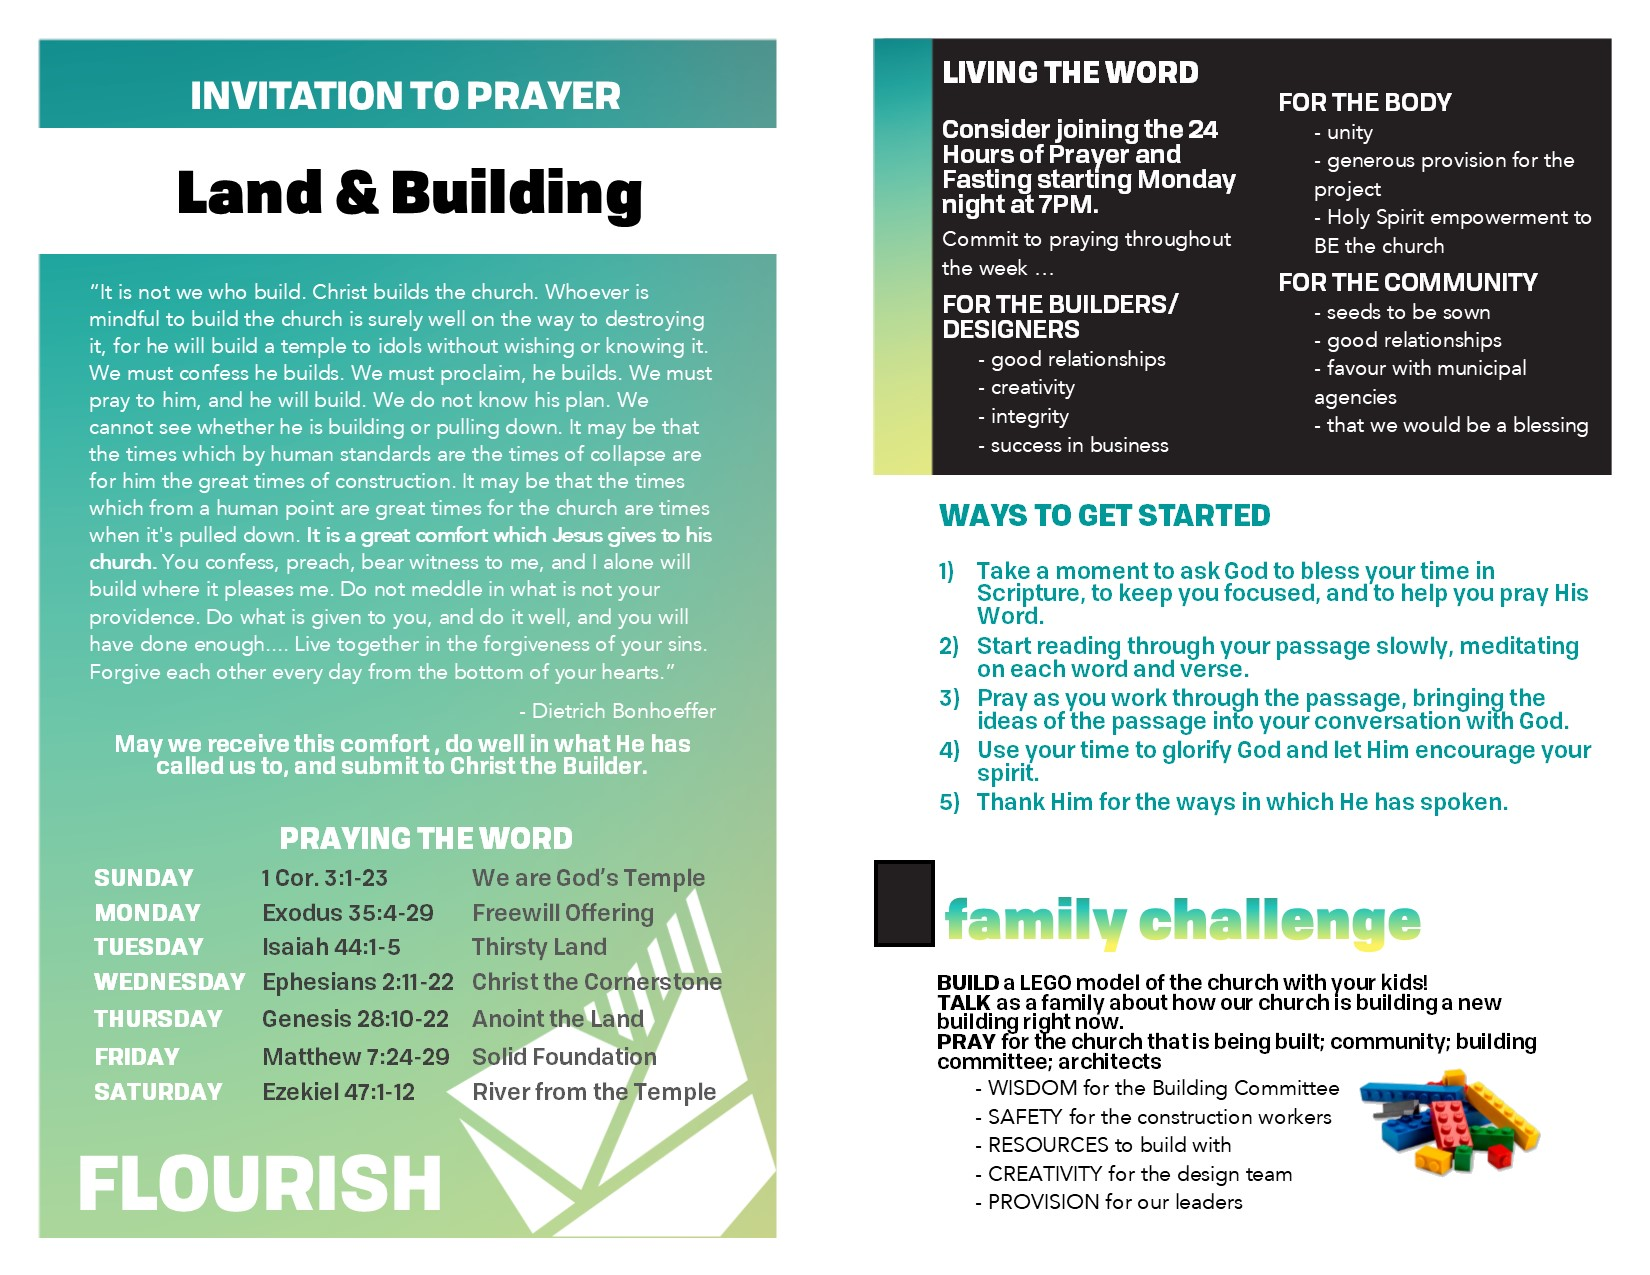 FLOURISH Land and Building.jpg